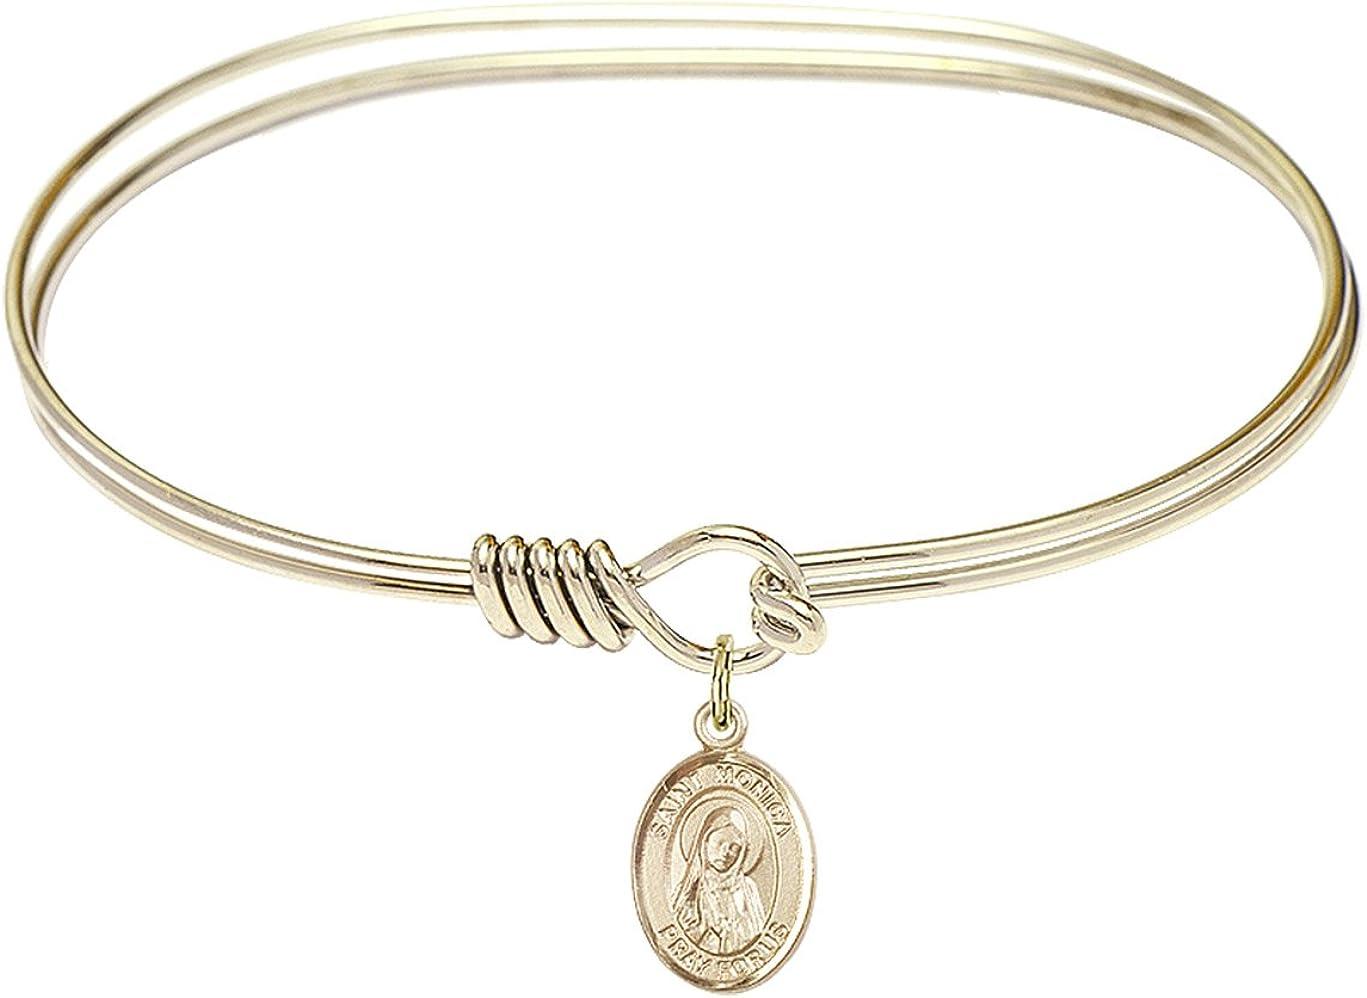 DiamondJewelryNY Eye Hook Bangle Bracelet with a St. Monica Charm.